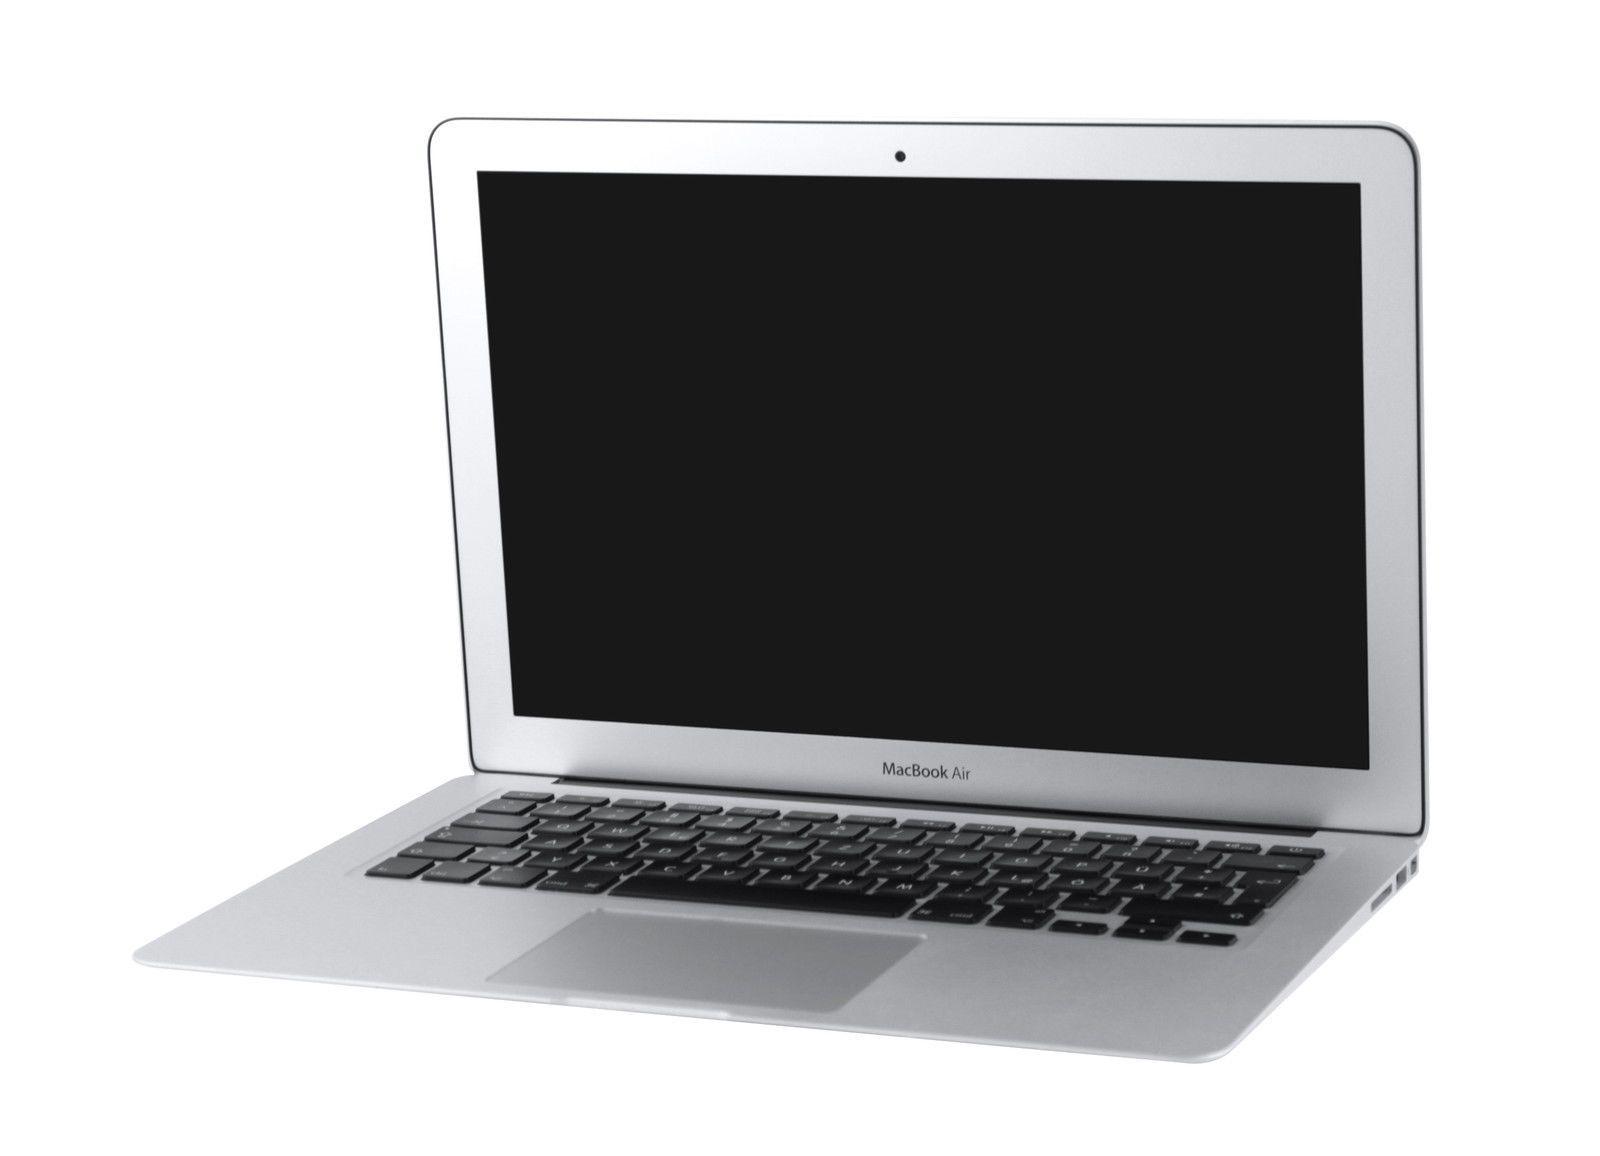 Apple Macbook Air Core I5 13ghz 4gb Ram 128gb T Mnyl2 New 2017 Gold 12 Inch 512gb 133 213 Ghz 4 Gb